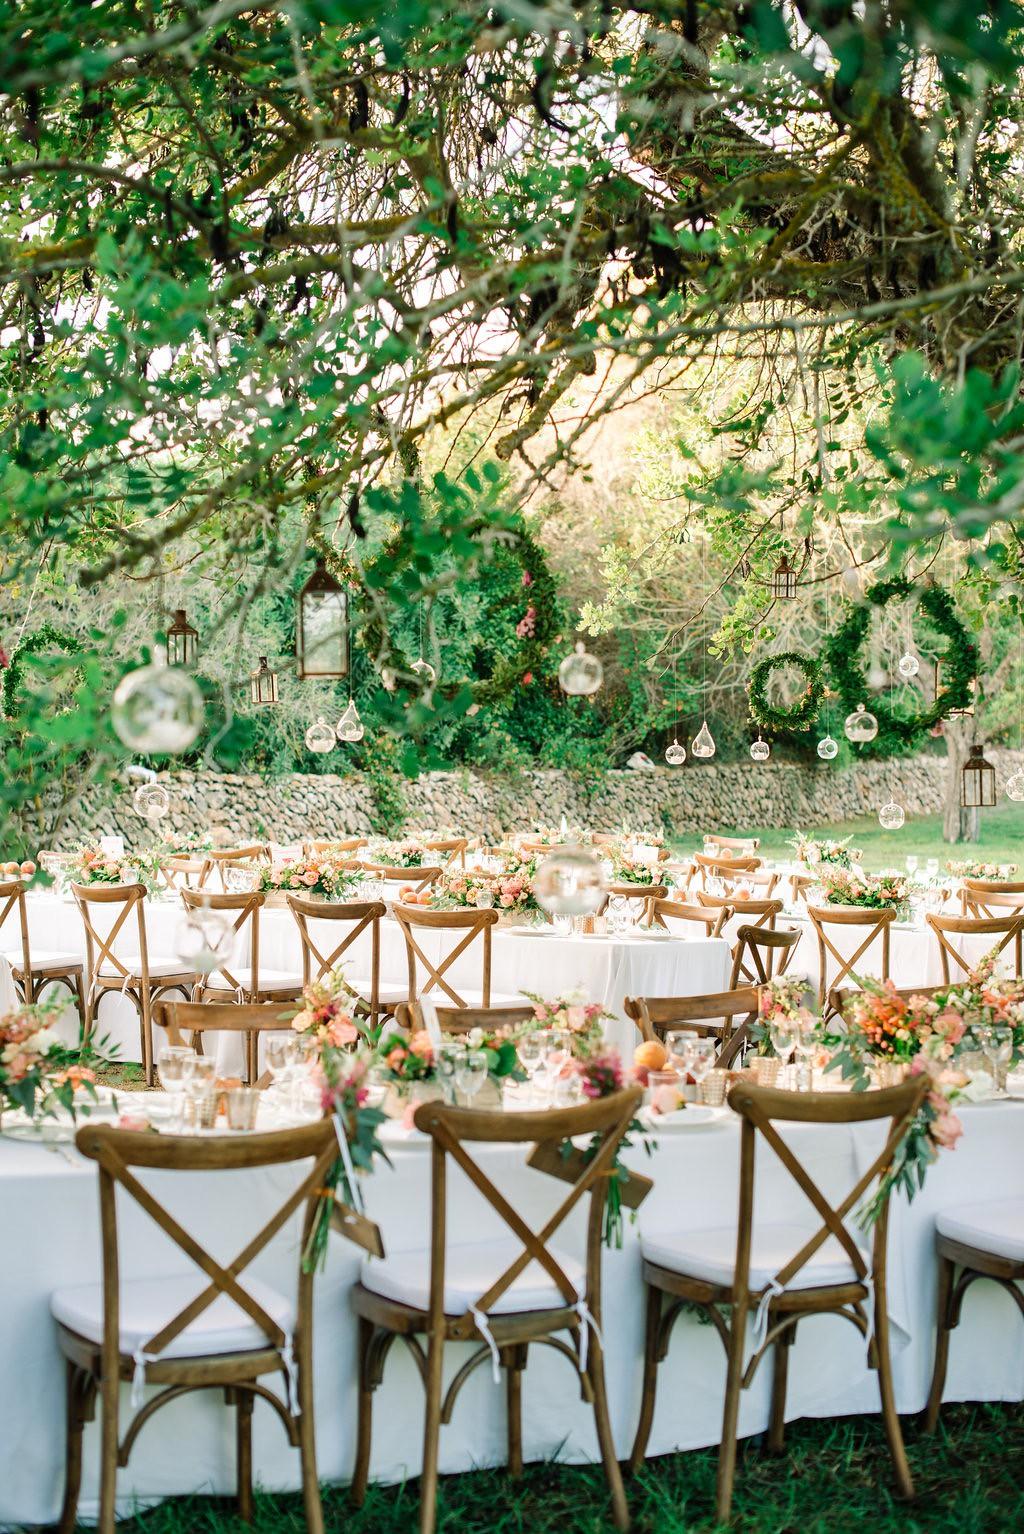 https://www.white-ibiza.com/wp-content/uploads/2020/03/white-ibiza-weddings-velvet-circus-ibiza-2020-12.jpg